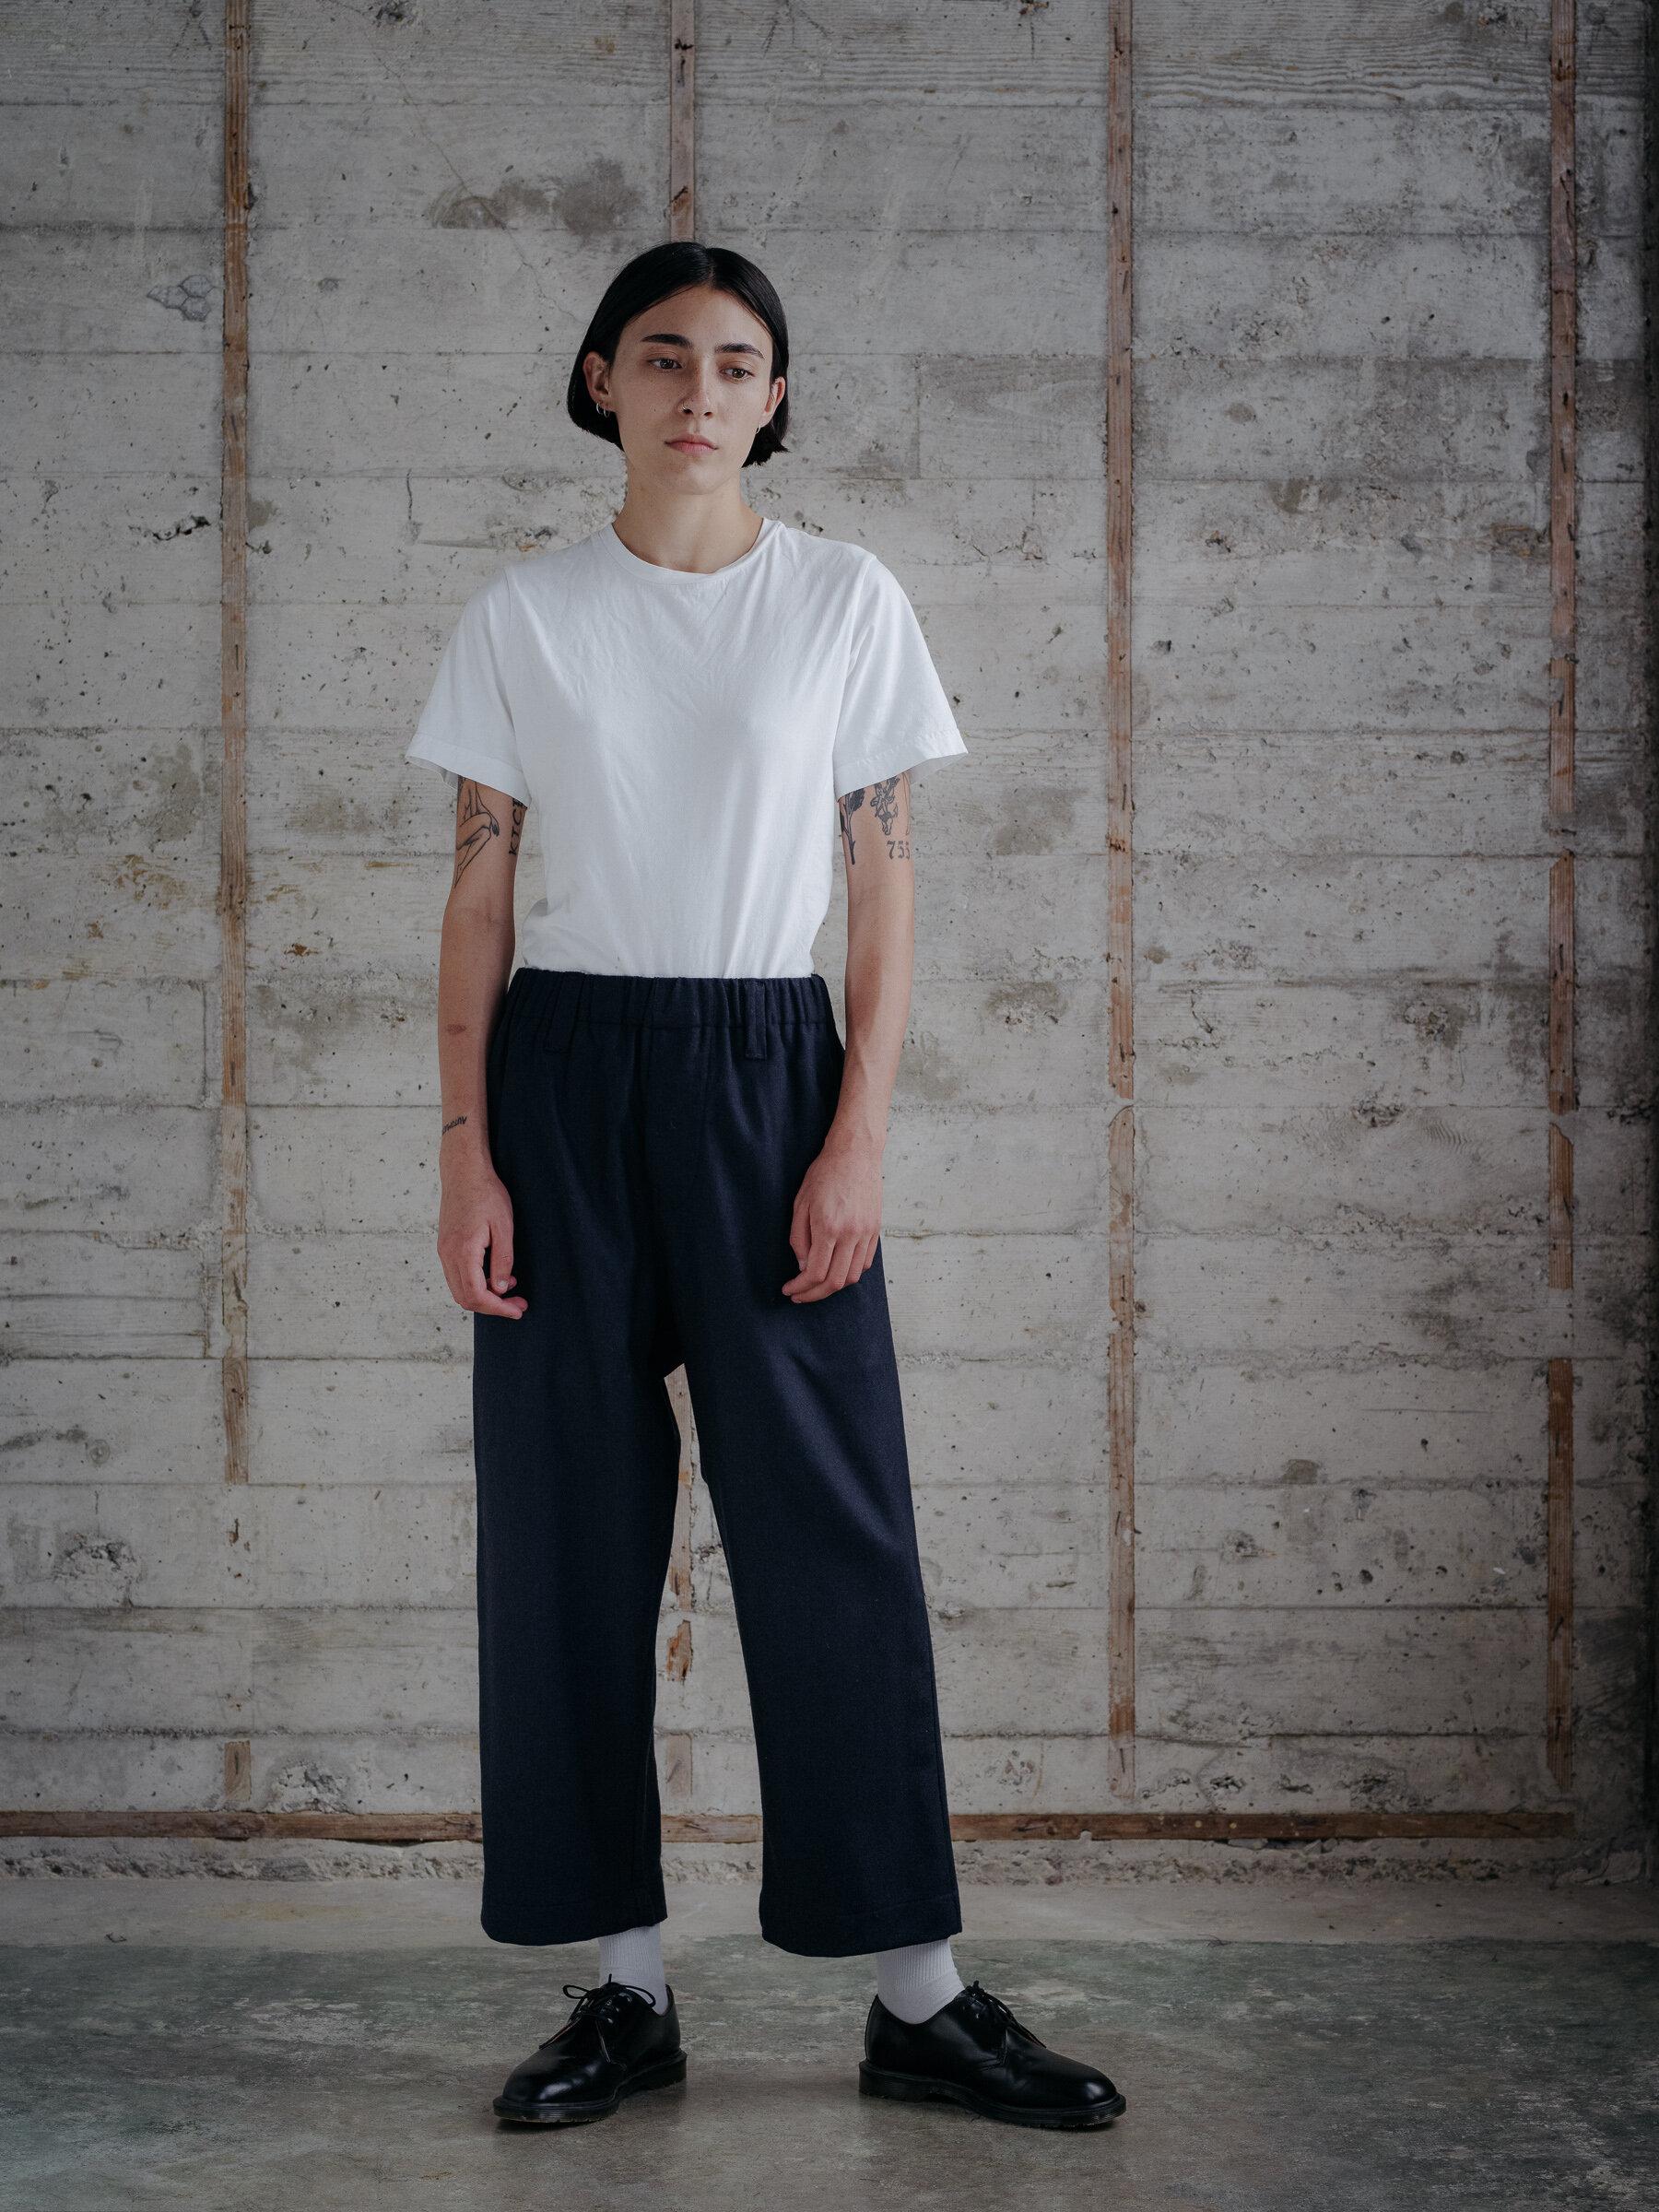 evan-kinori-elastic-pant-cashmere-lambswool-woven-in-england-made-in-san-francisco-9